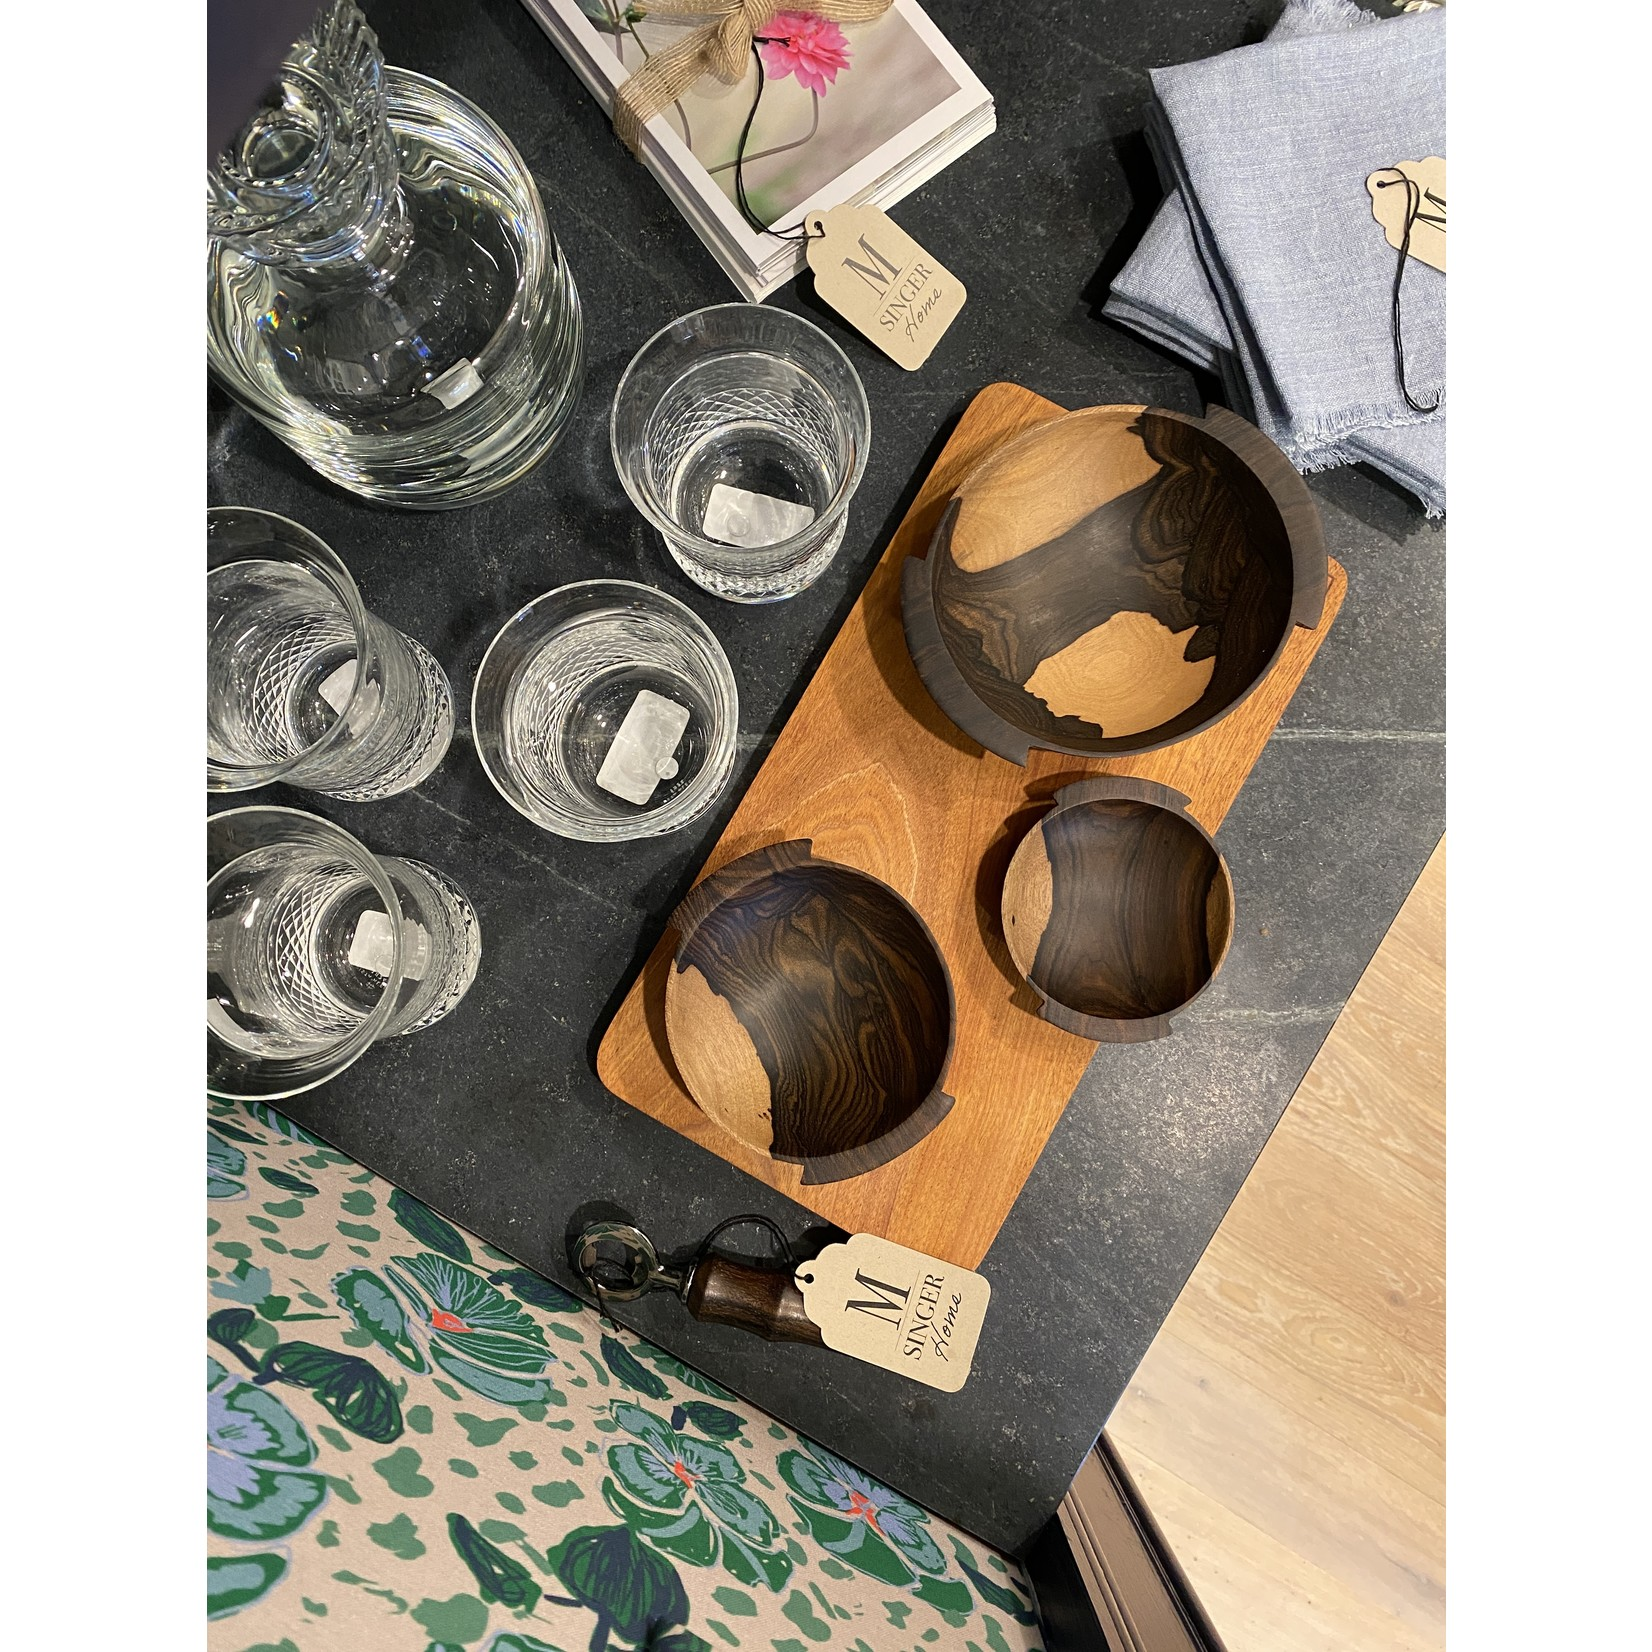 Itza Wood Nesting Bowls (Set of 3)